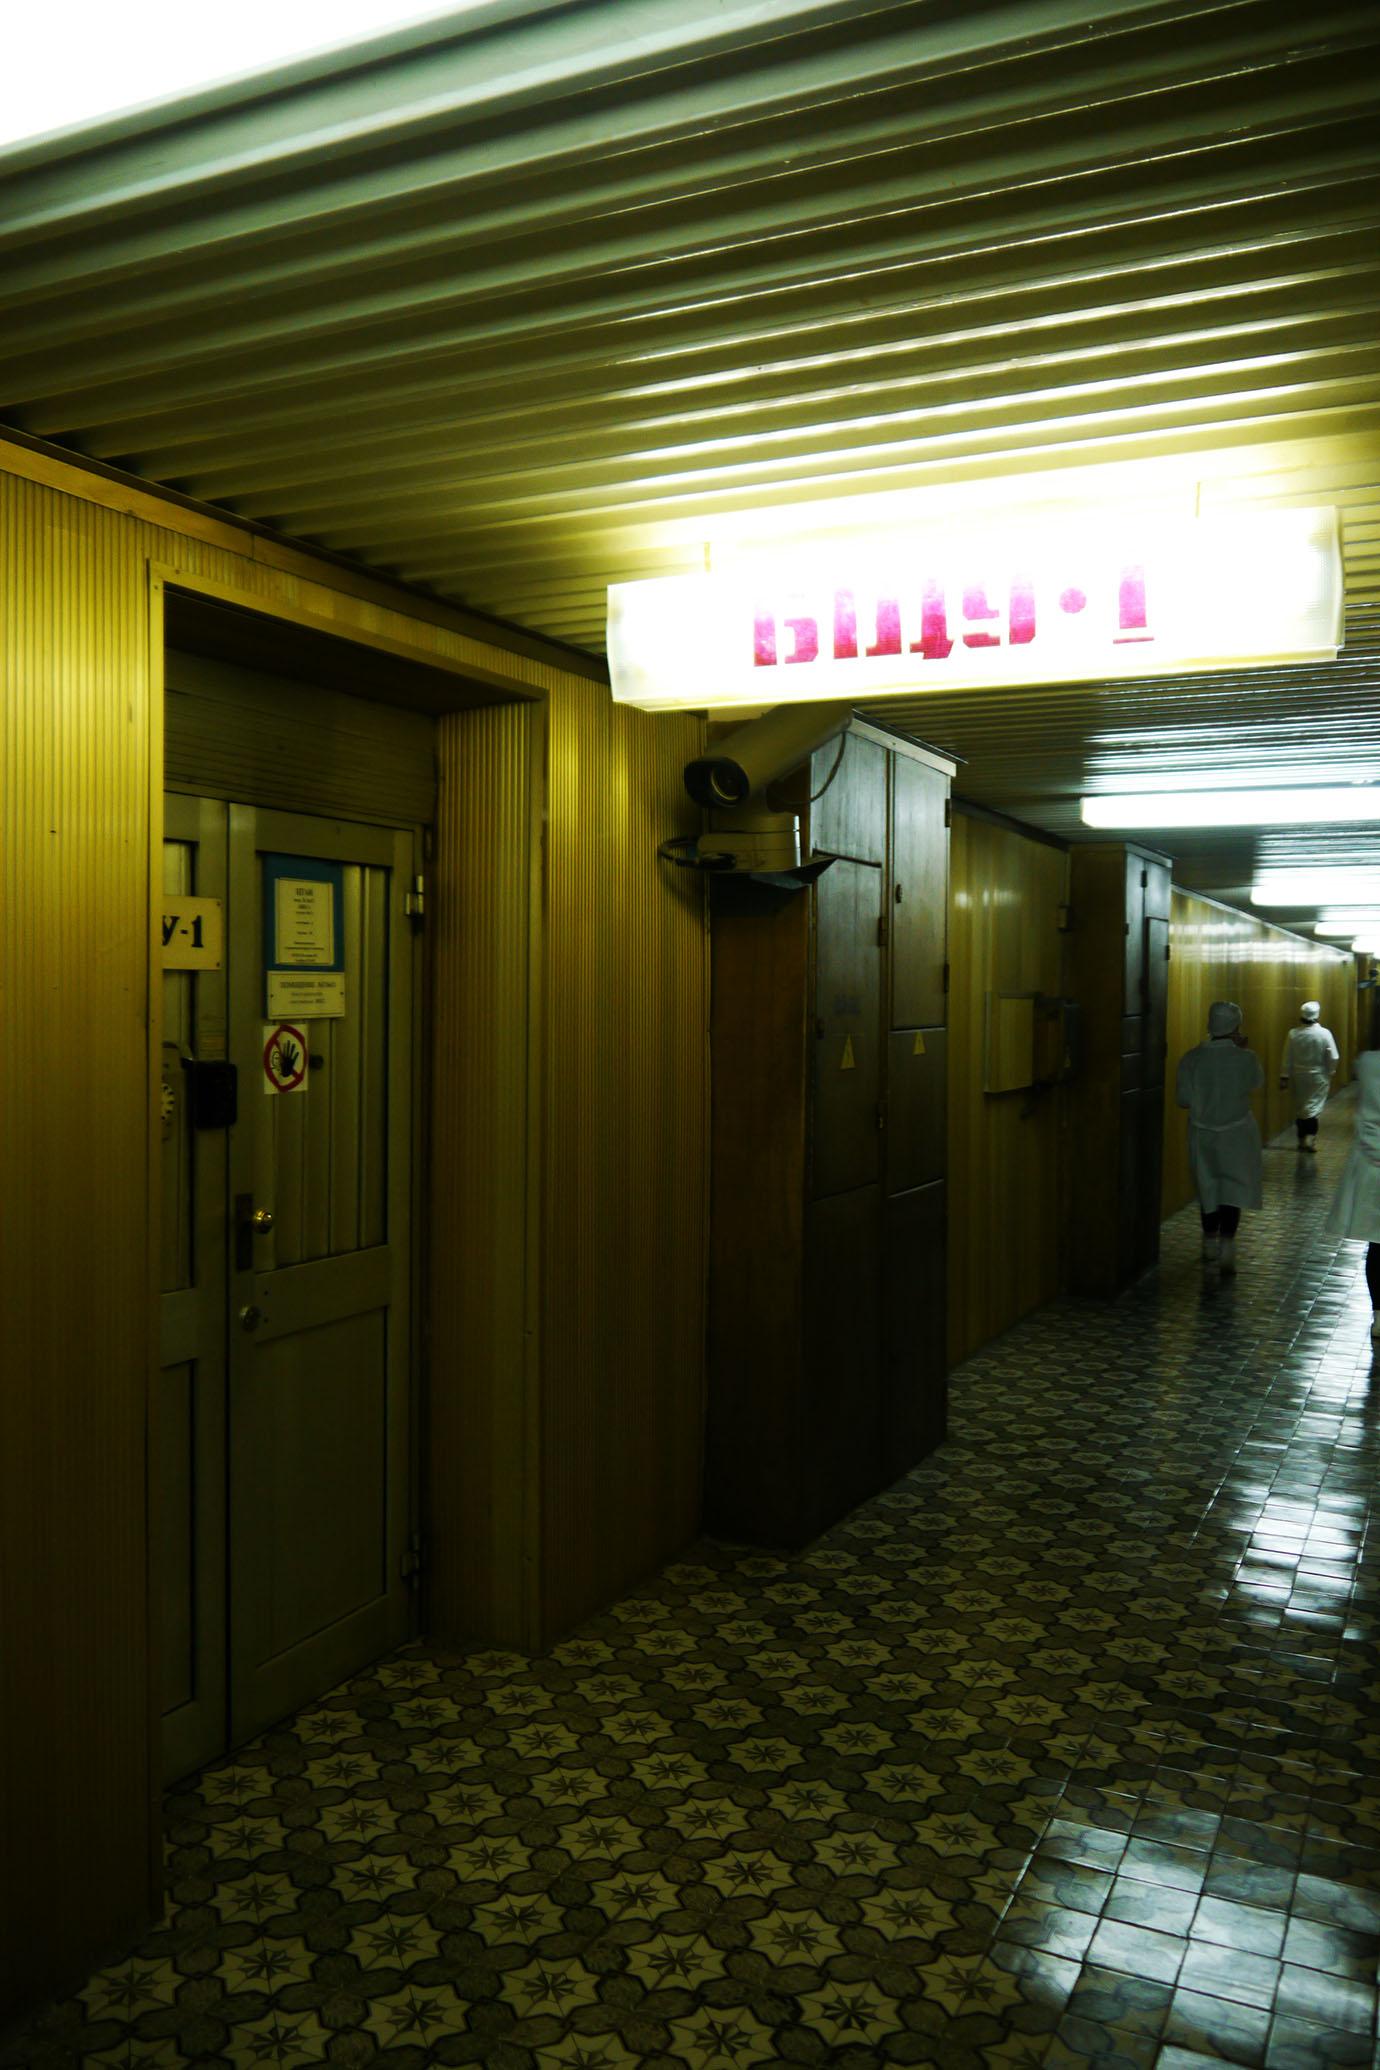 chernobyl-disaster10